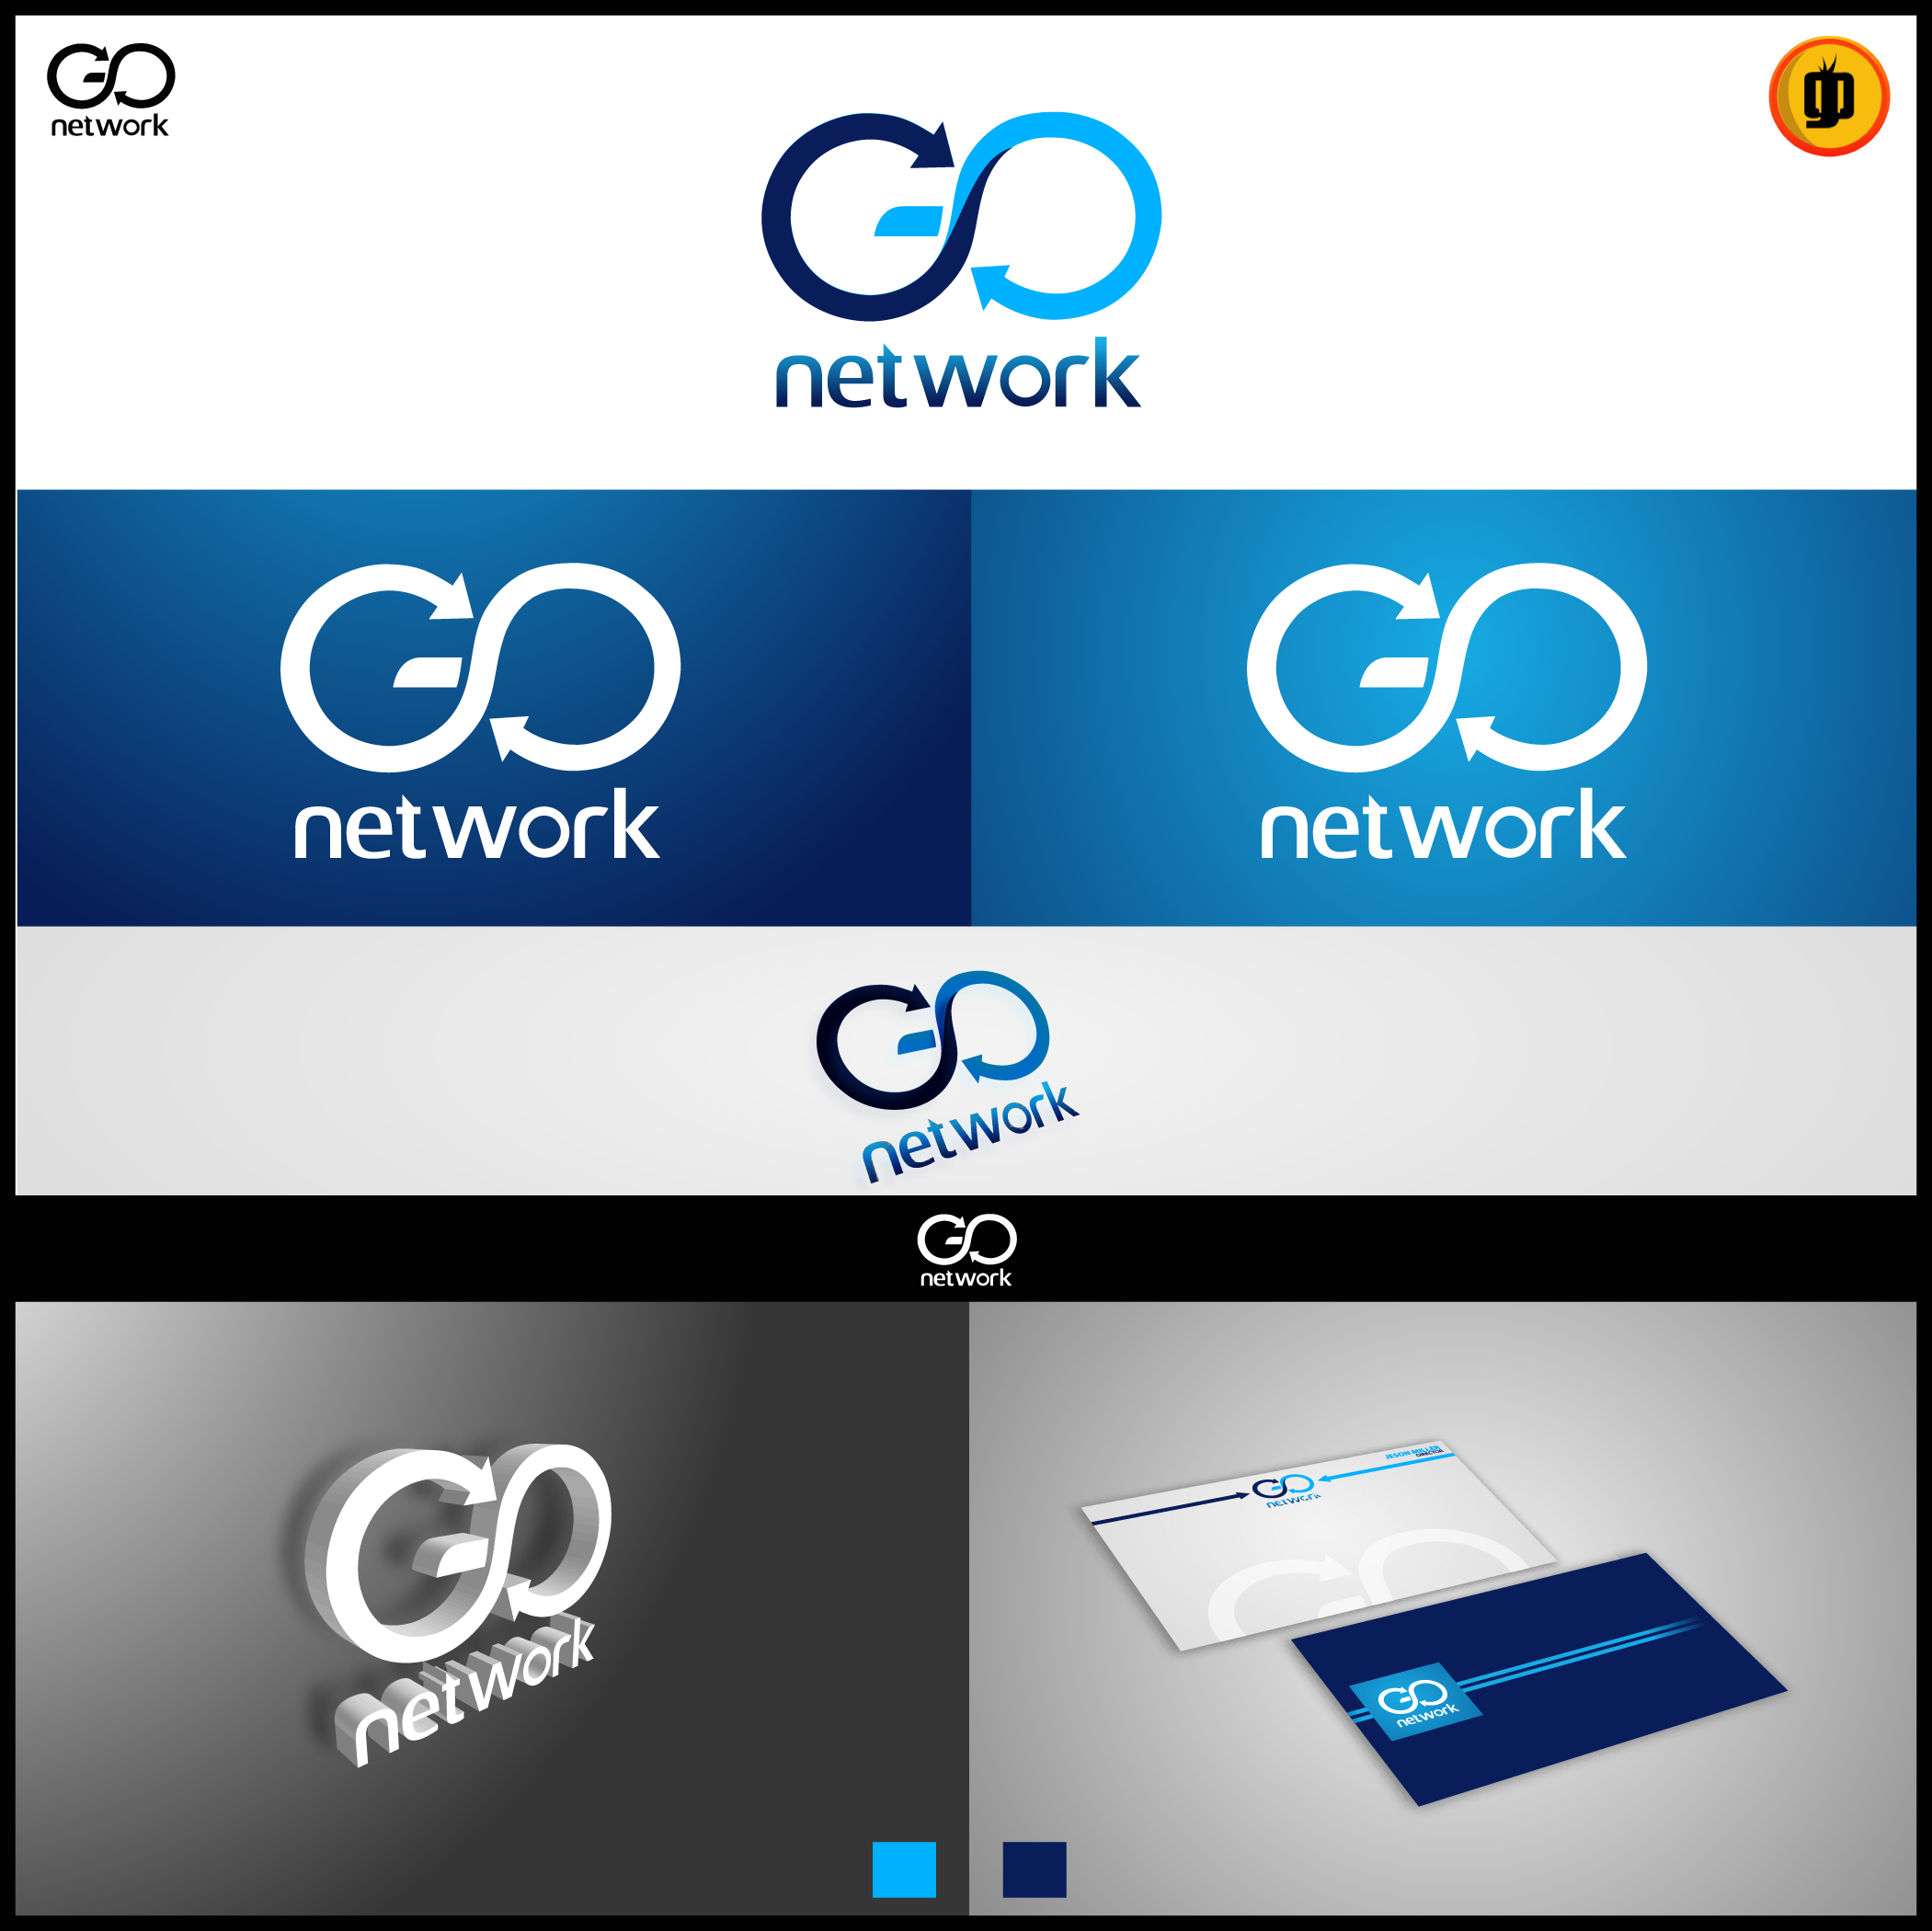 GO NETWORK